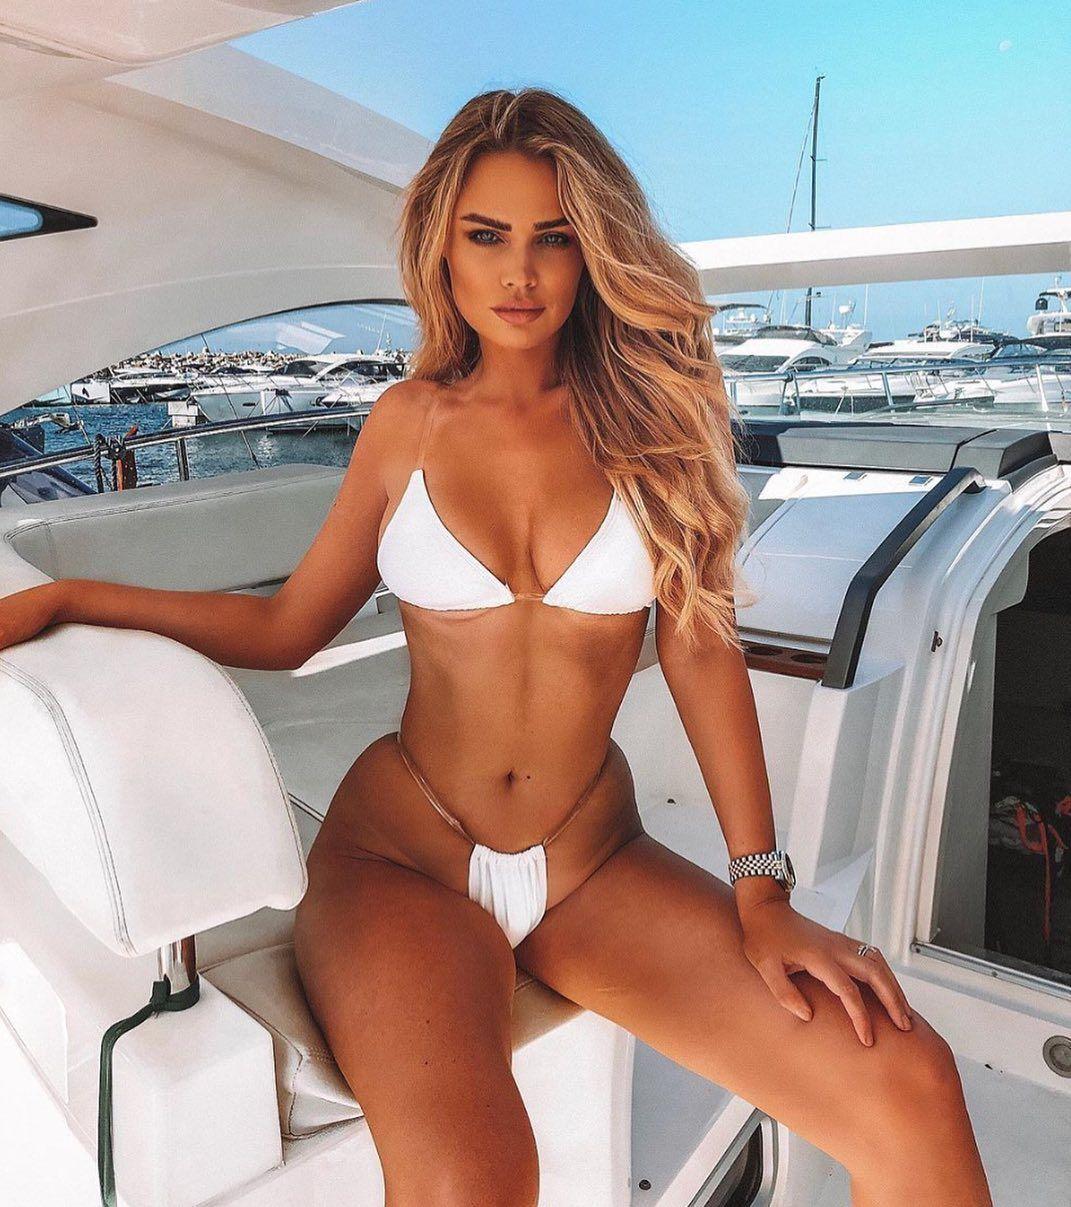 Clear Skies 2 Piece Pvc Strap Bikini White In 2020 Bikinis Rachel Ward Strap Bikini